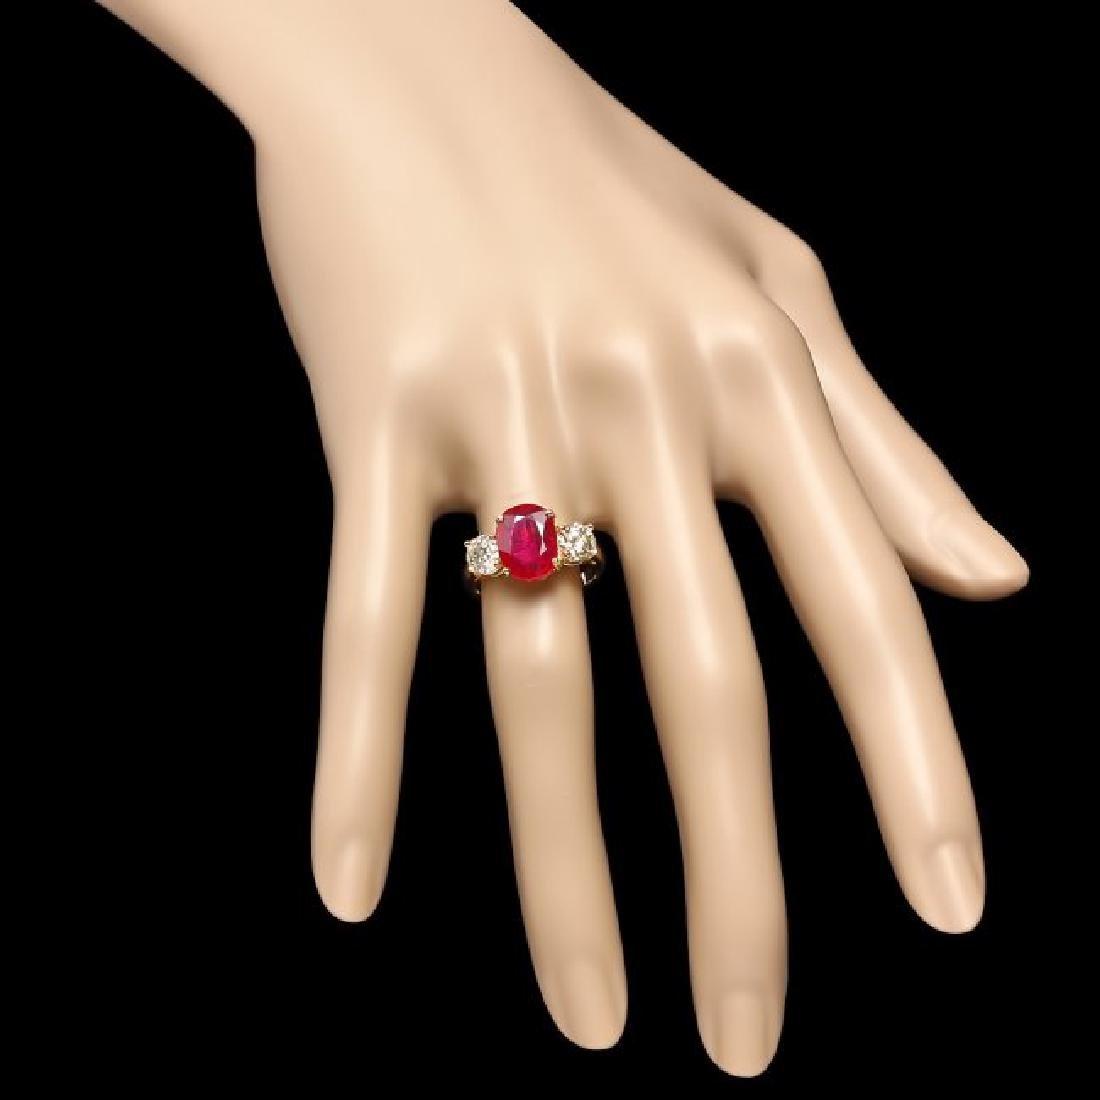 14k Yellow Gold 3.00ct Ruby 1.15ct Diamond Ring - 4